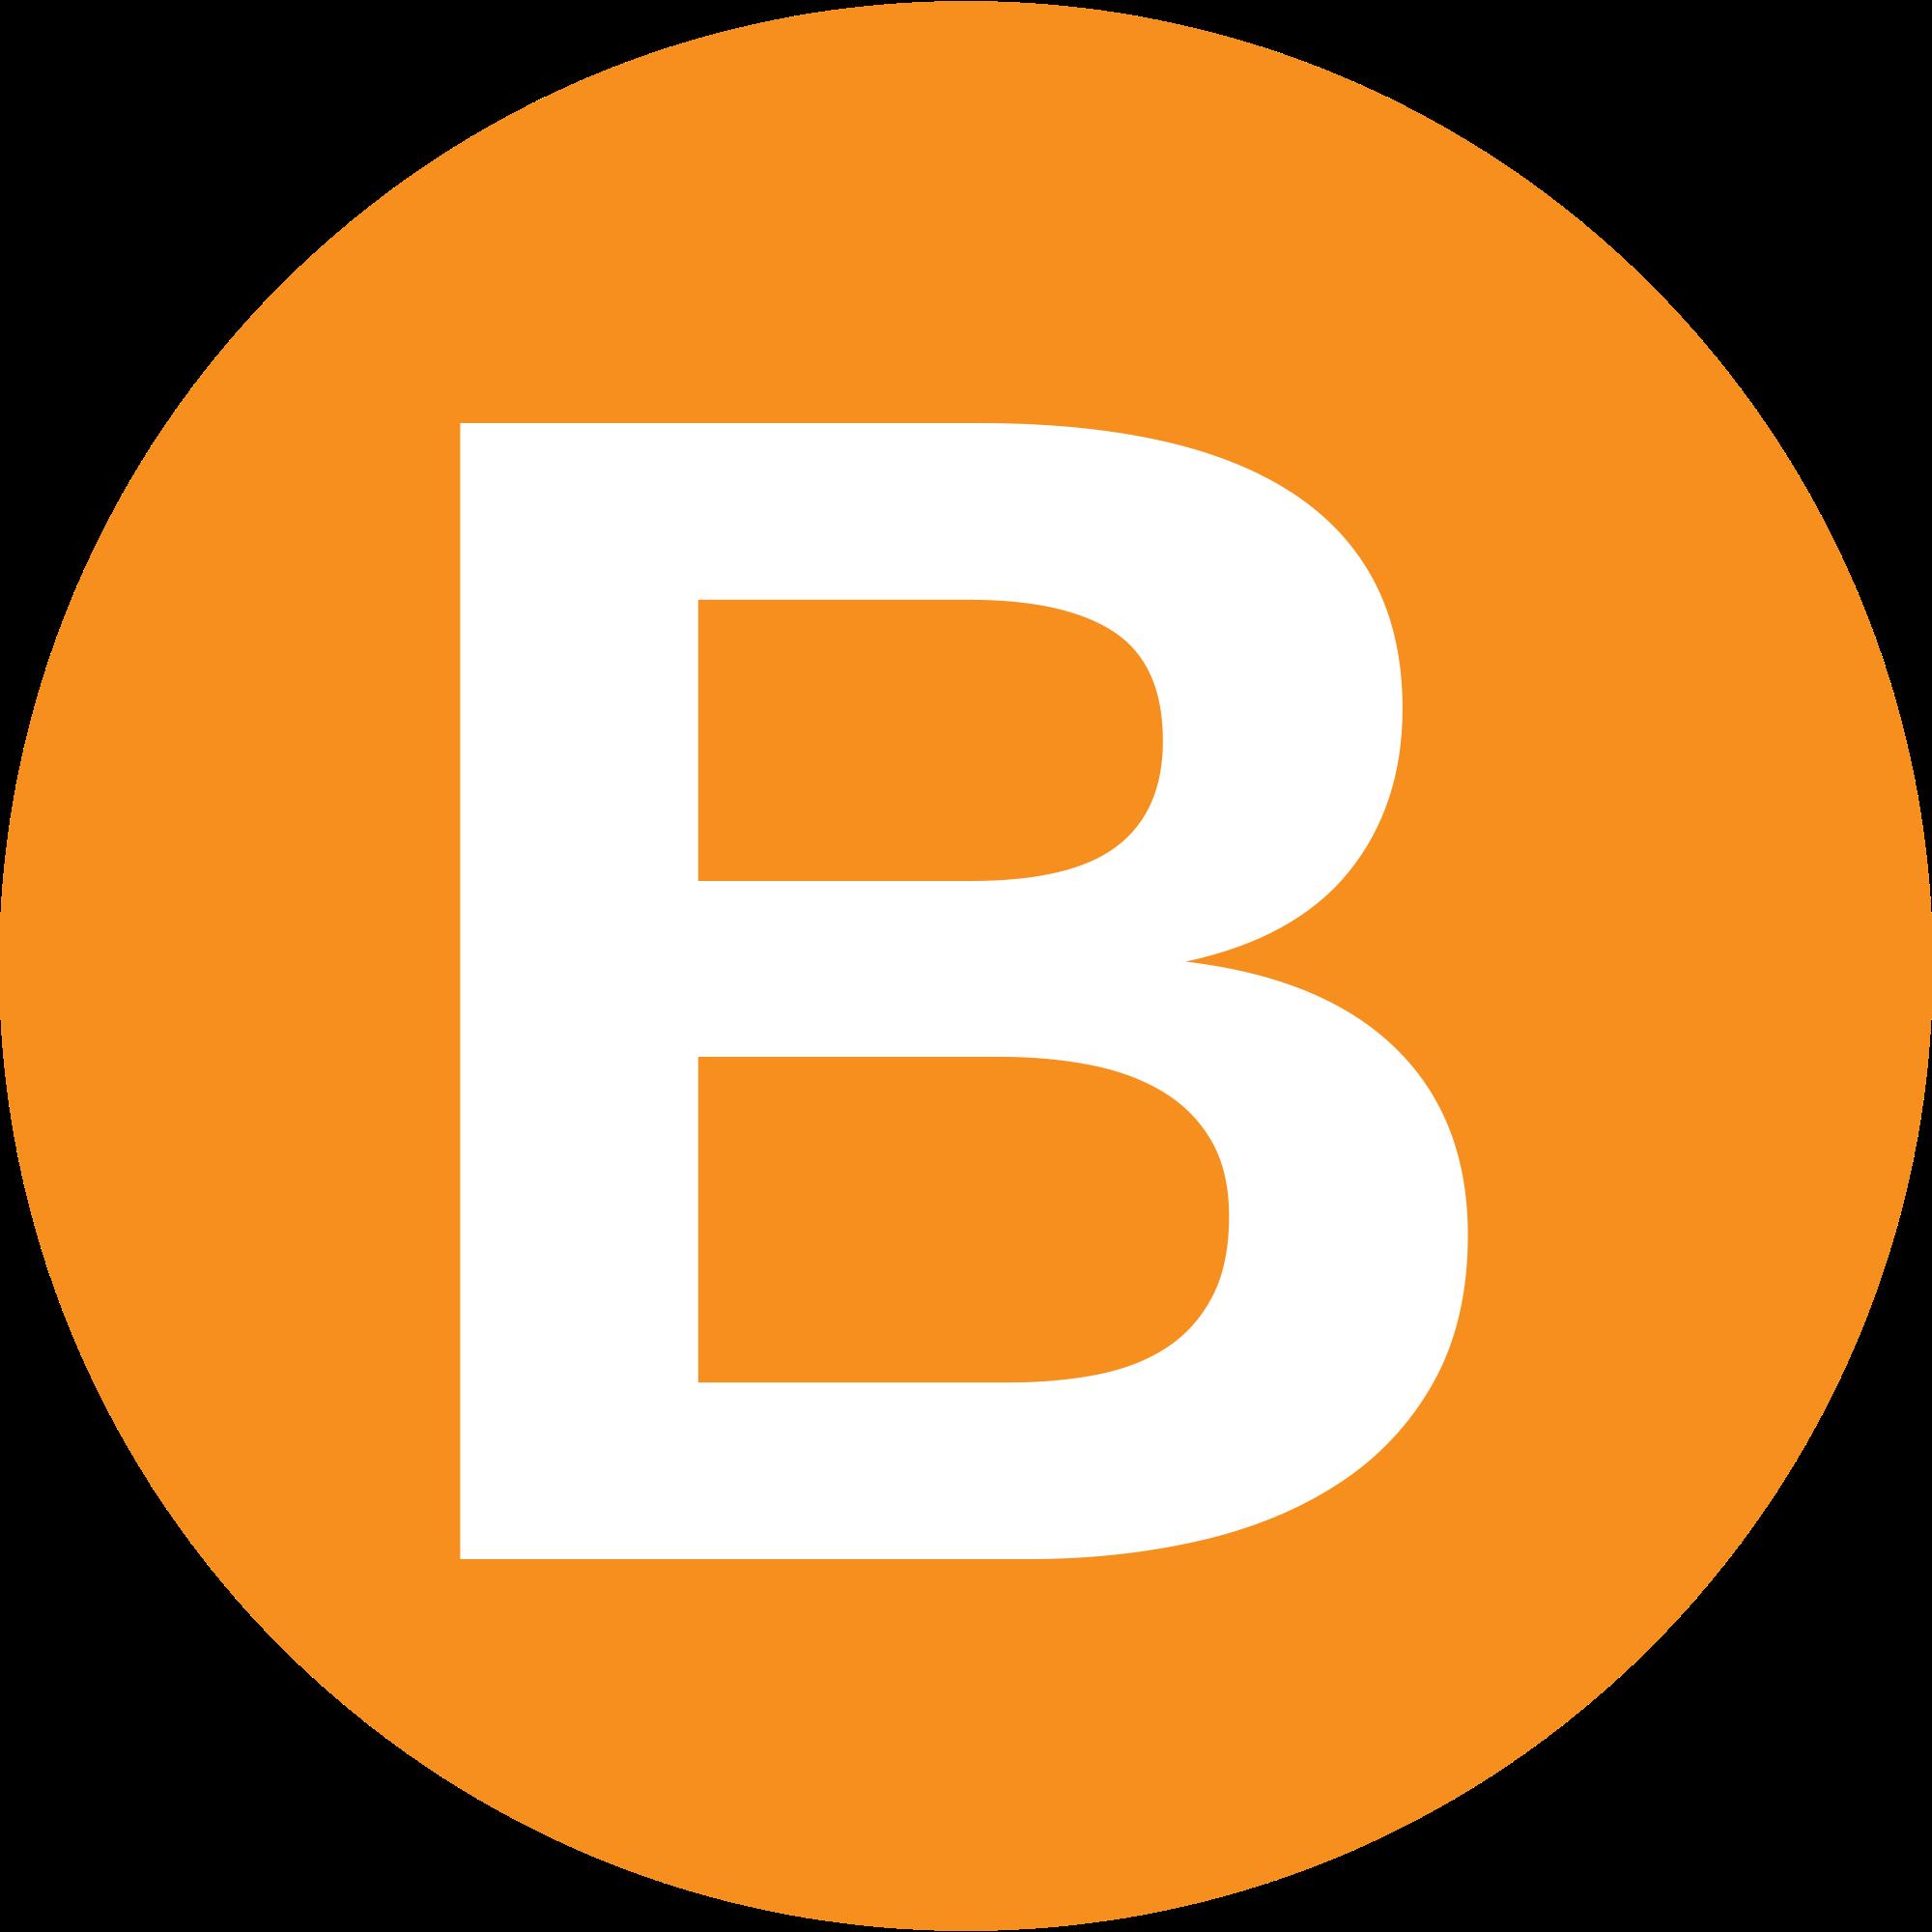 B Logo, Logospike.com: Famous And, Vector Logos